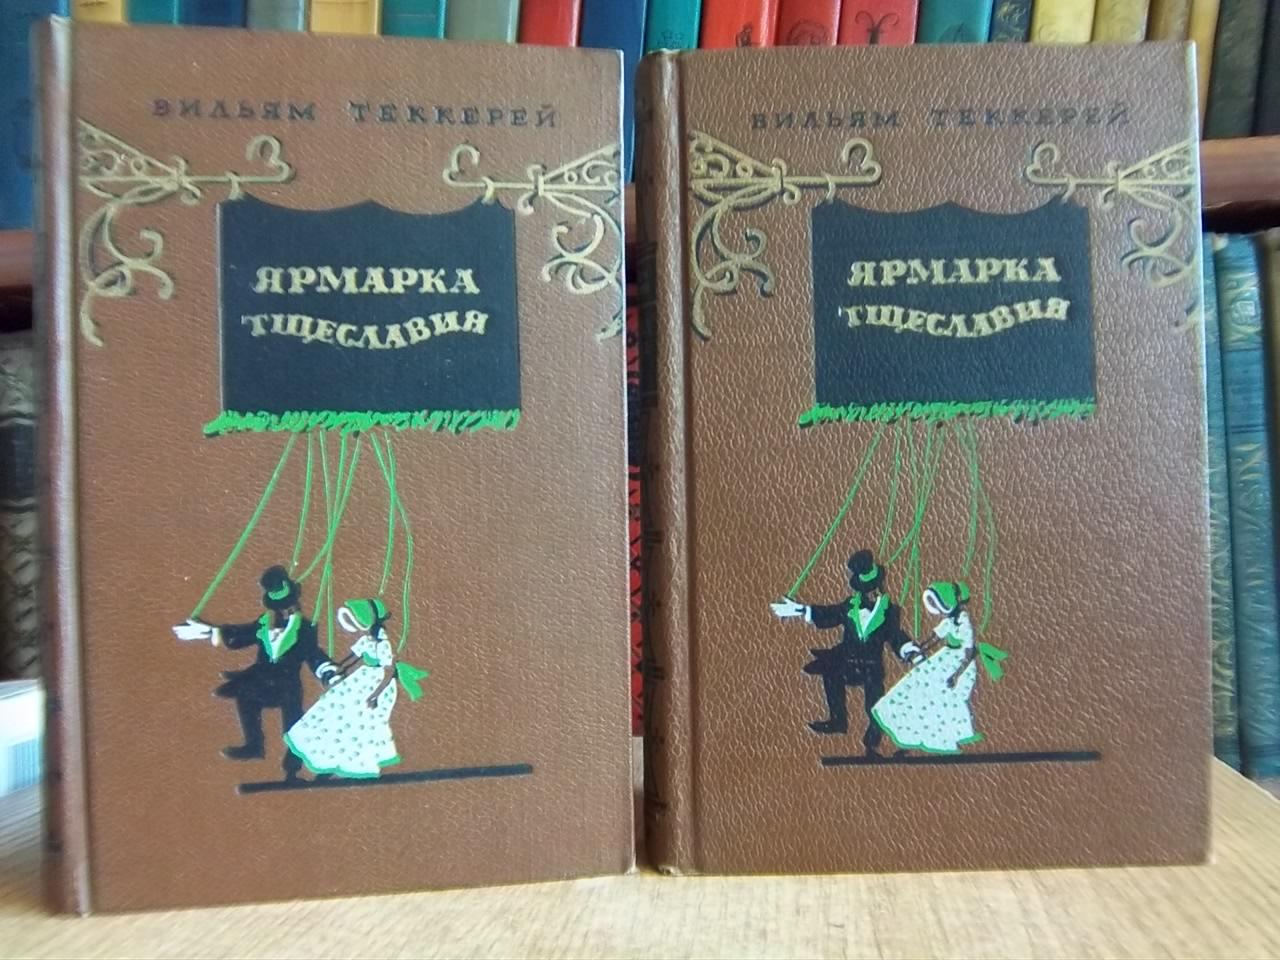 Ярмарка тщеславия В двух томах